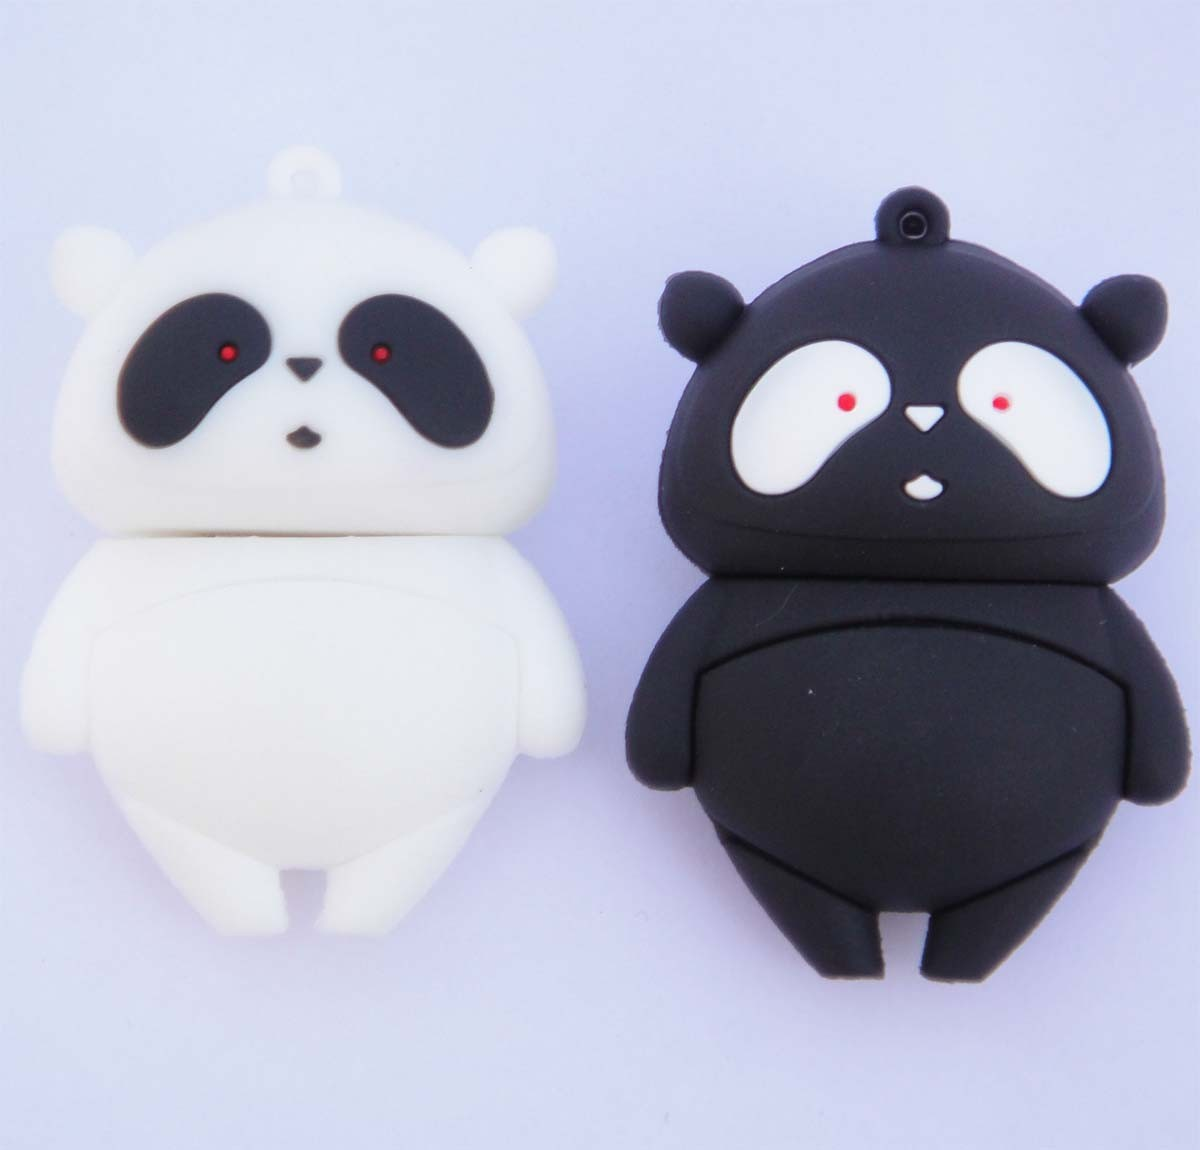 8GB/16GB/32GB Lovely Panda Shaped USB Flash Drive/Memory Stick Cute Pen Drive U-Disk EU68